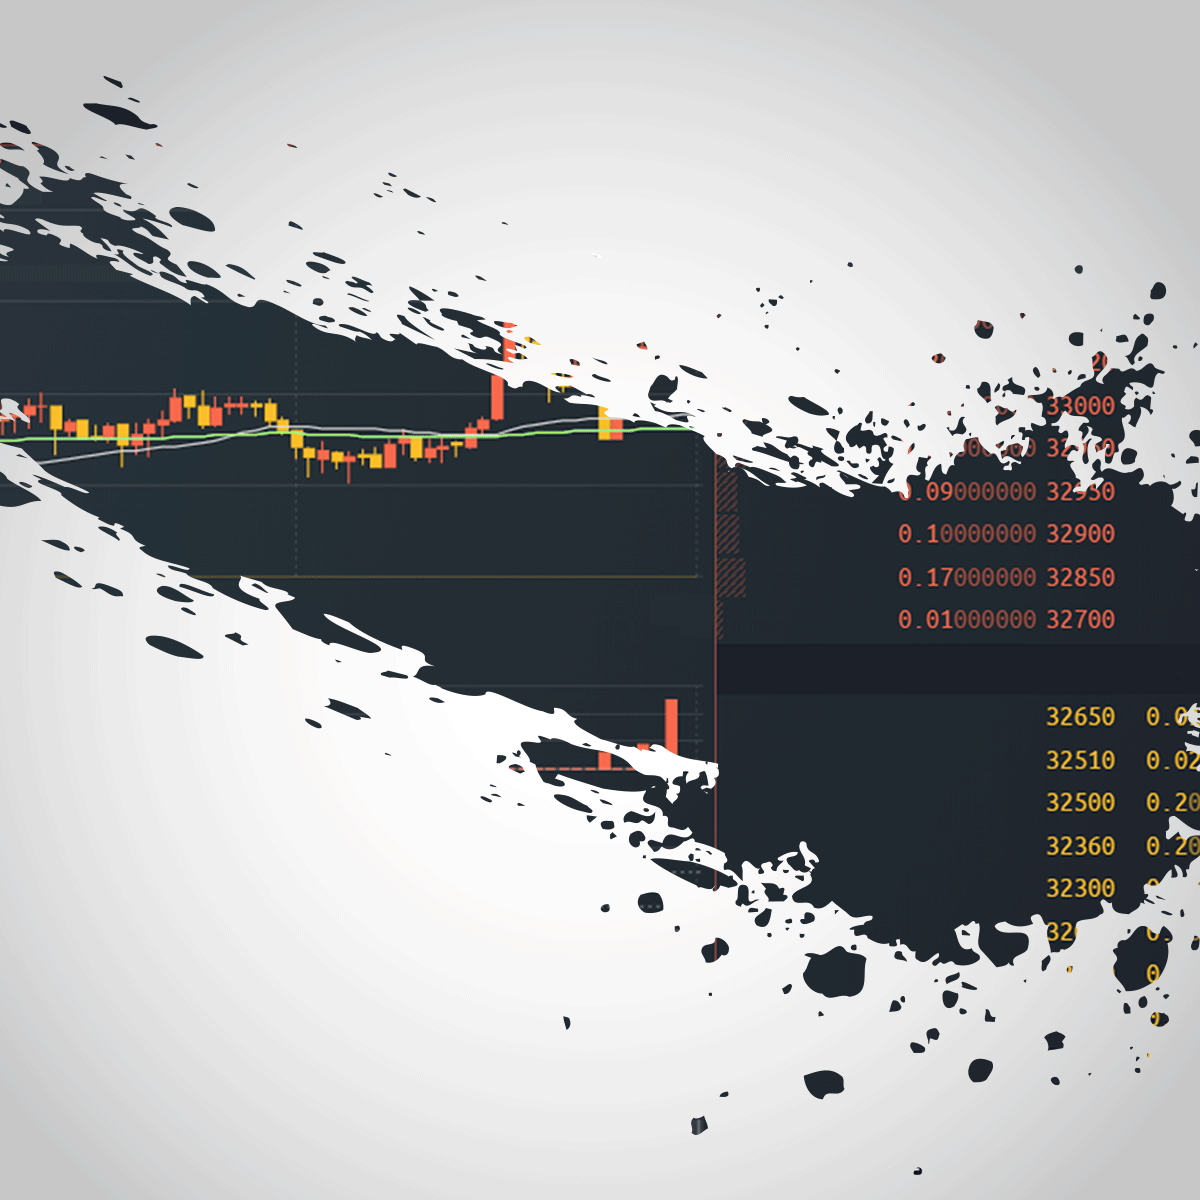 test ツイッターメディア - bitFlyerの最終取引価格 = ¥680,525 best_bid = ¥680,525 best_ask = ¥680,822 (2020年04月01日 19時38分14秒) #ビットフライヤー https://t.co/ZXVTZor2ji